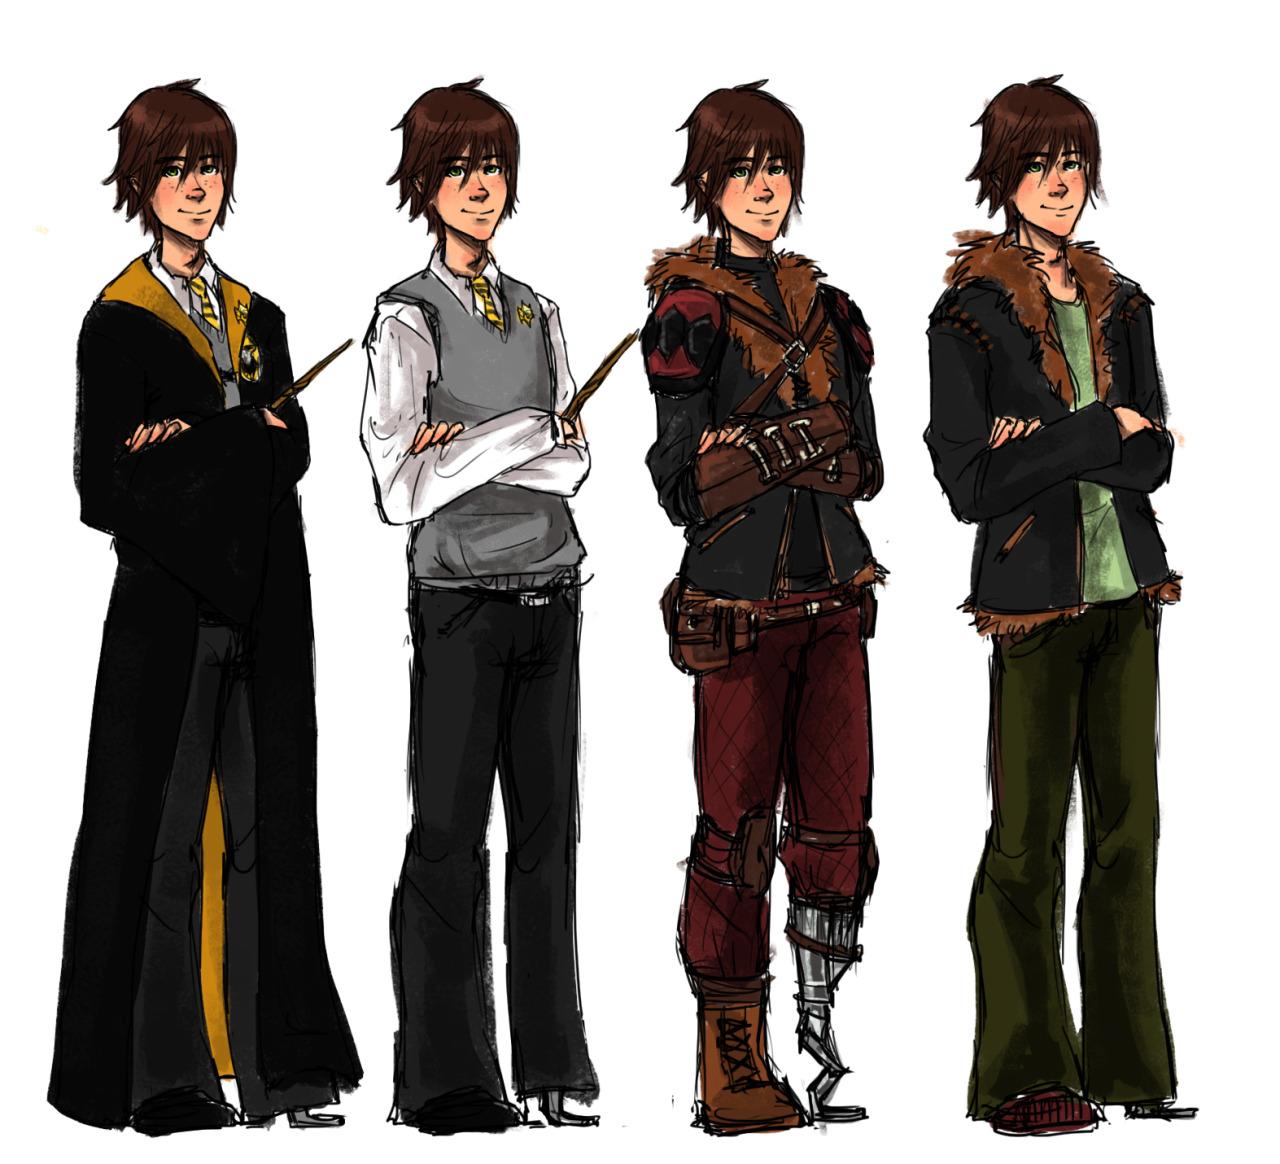 Hogwarts Au Is Best Au The Dragon Tamer First Name